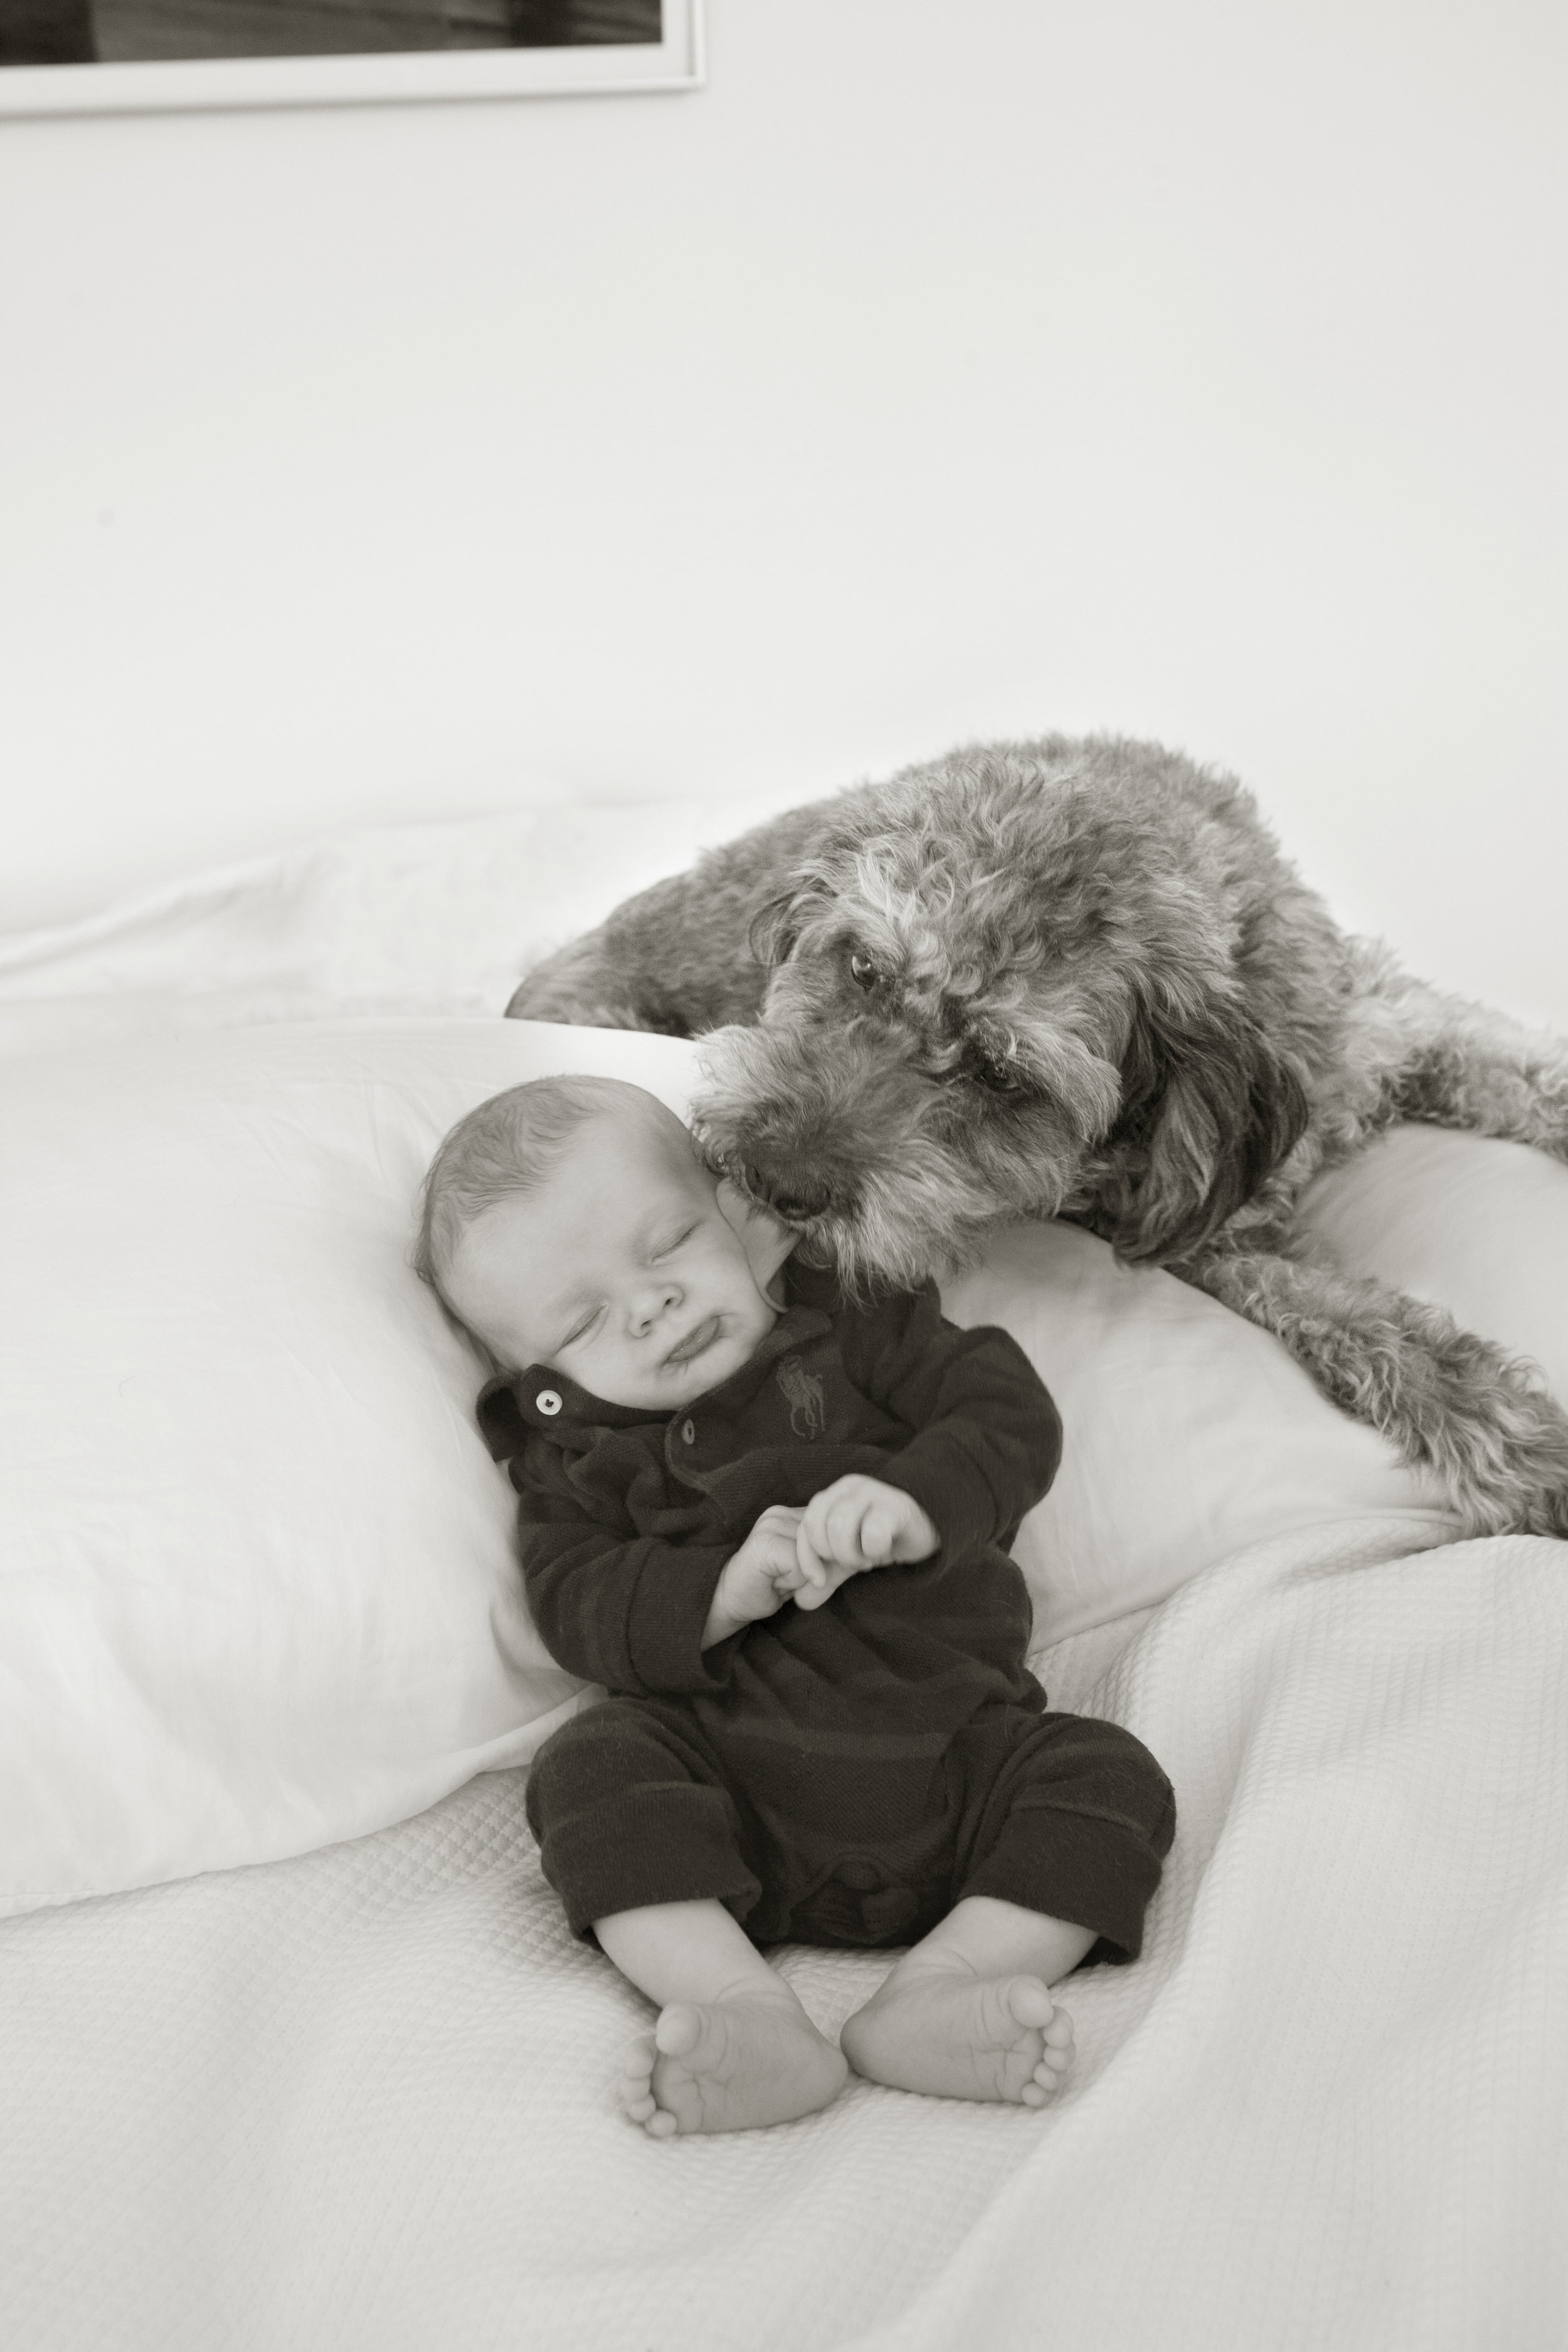 Precious newborn resting in loving company of man's best friend. Photo by Lucille Khornak.